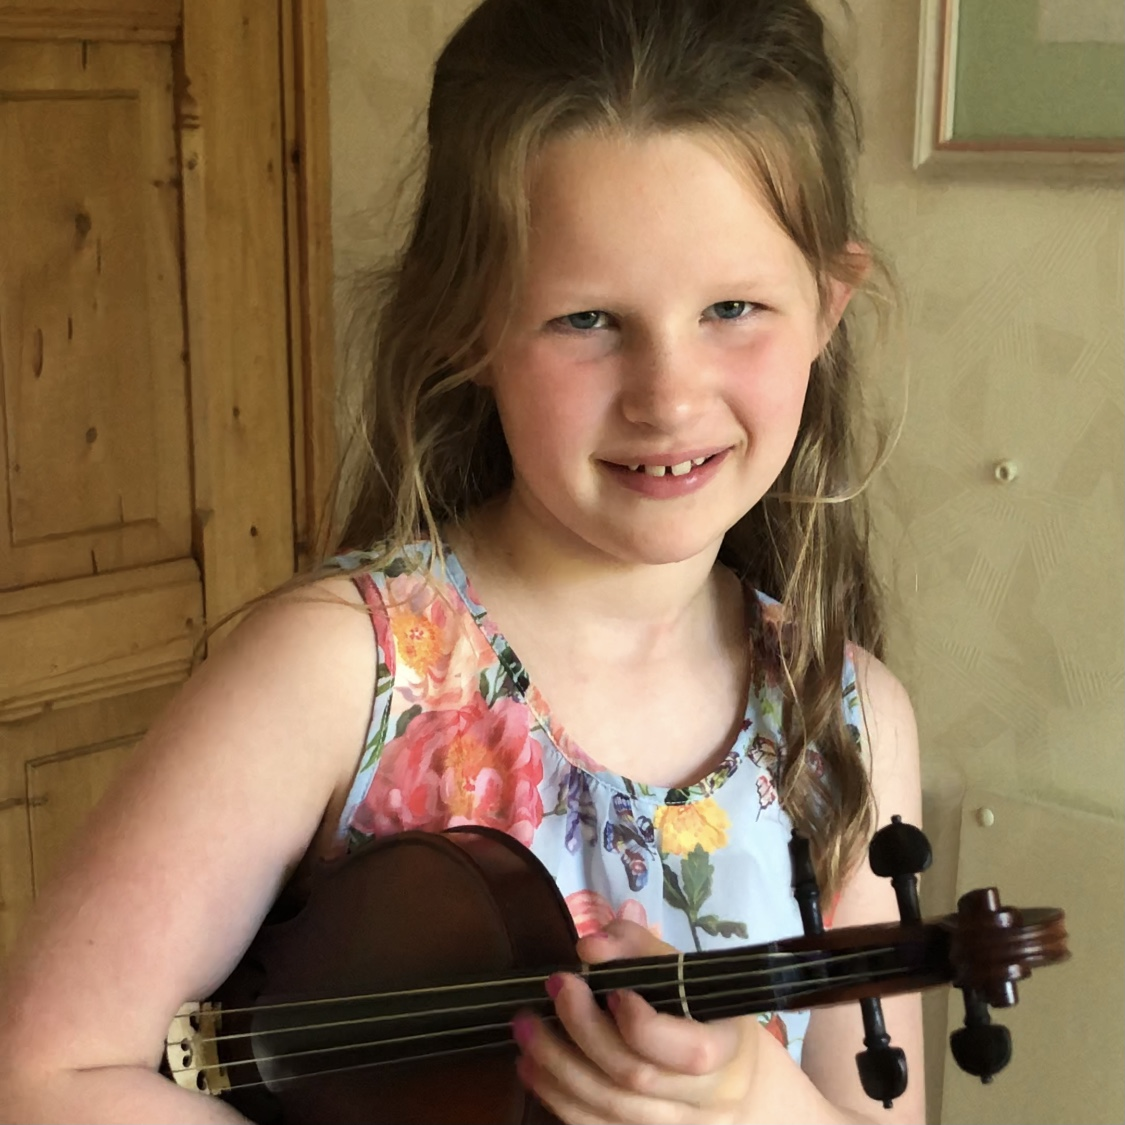 Lize vertelt waarom ze viool speelt